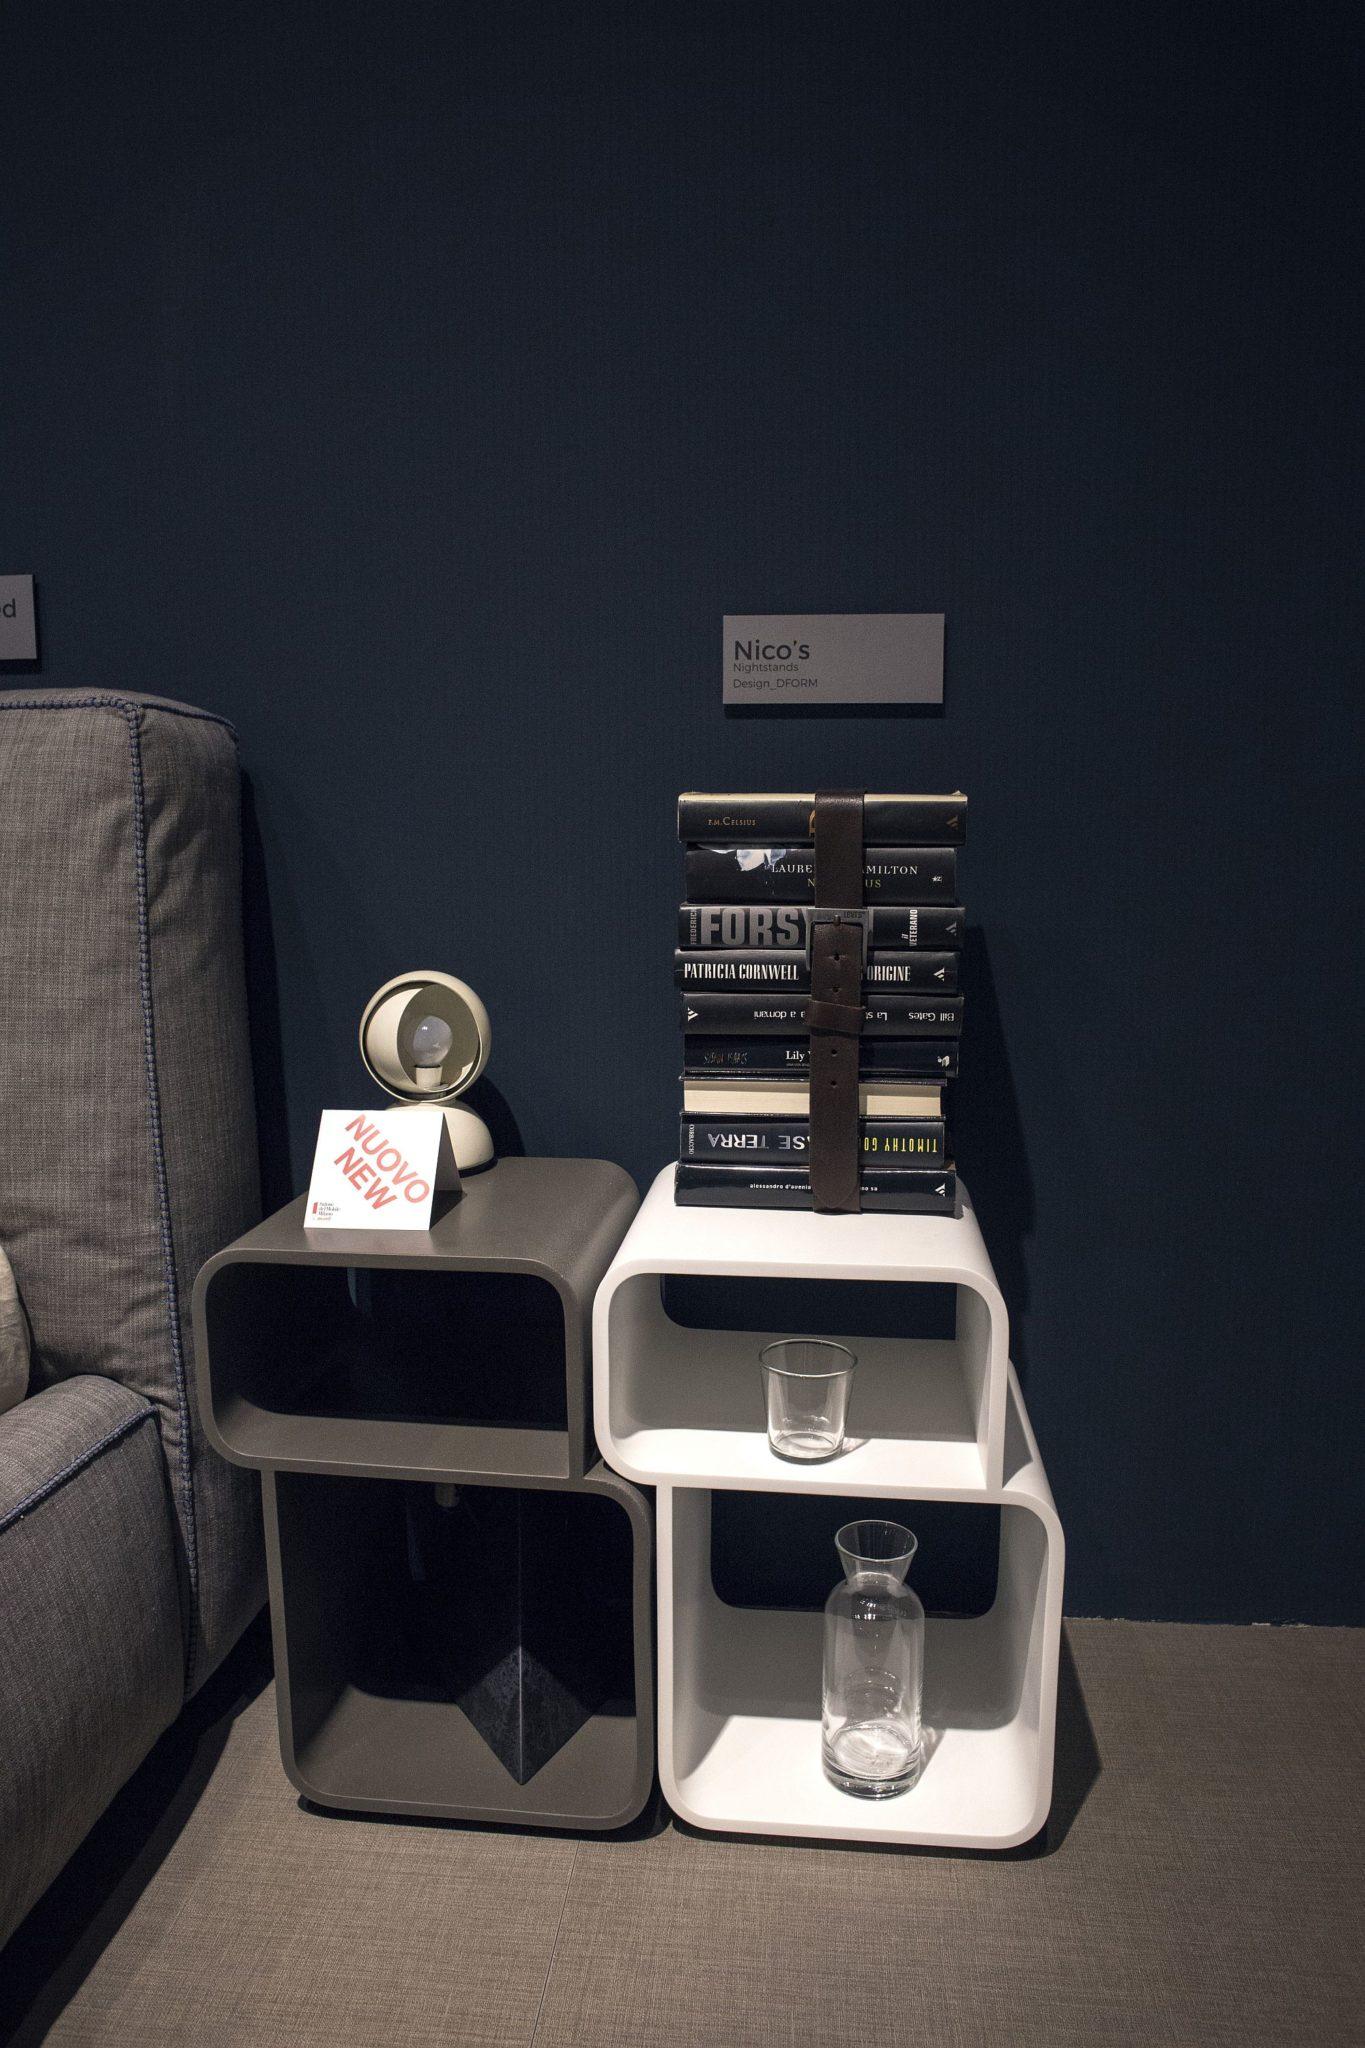 Modular nightstand for the minimal, modern bedroom